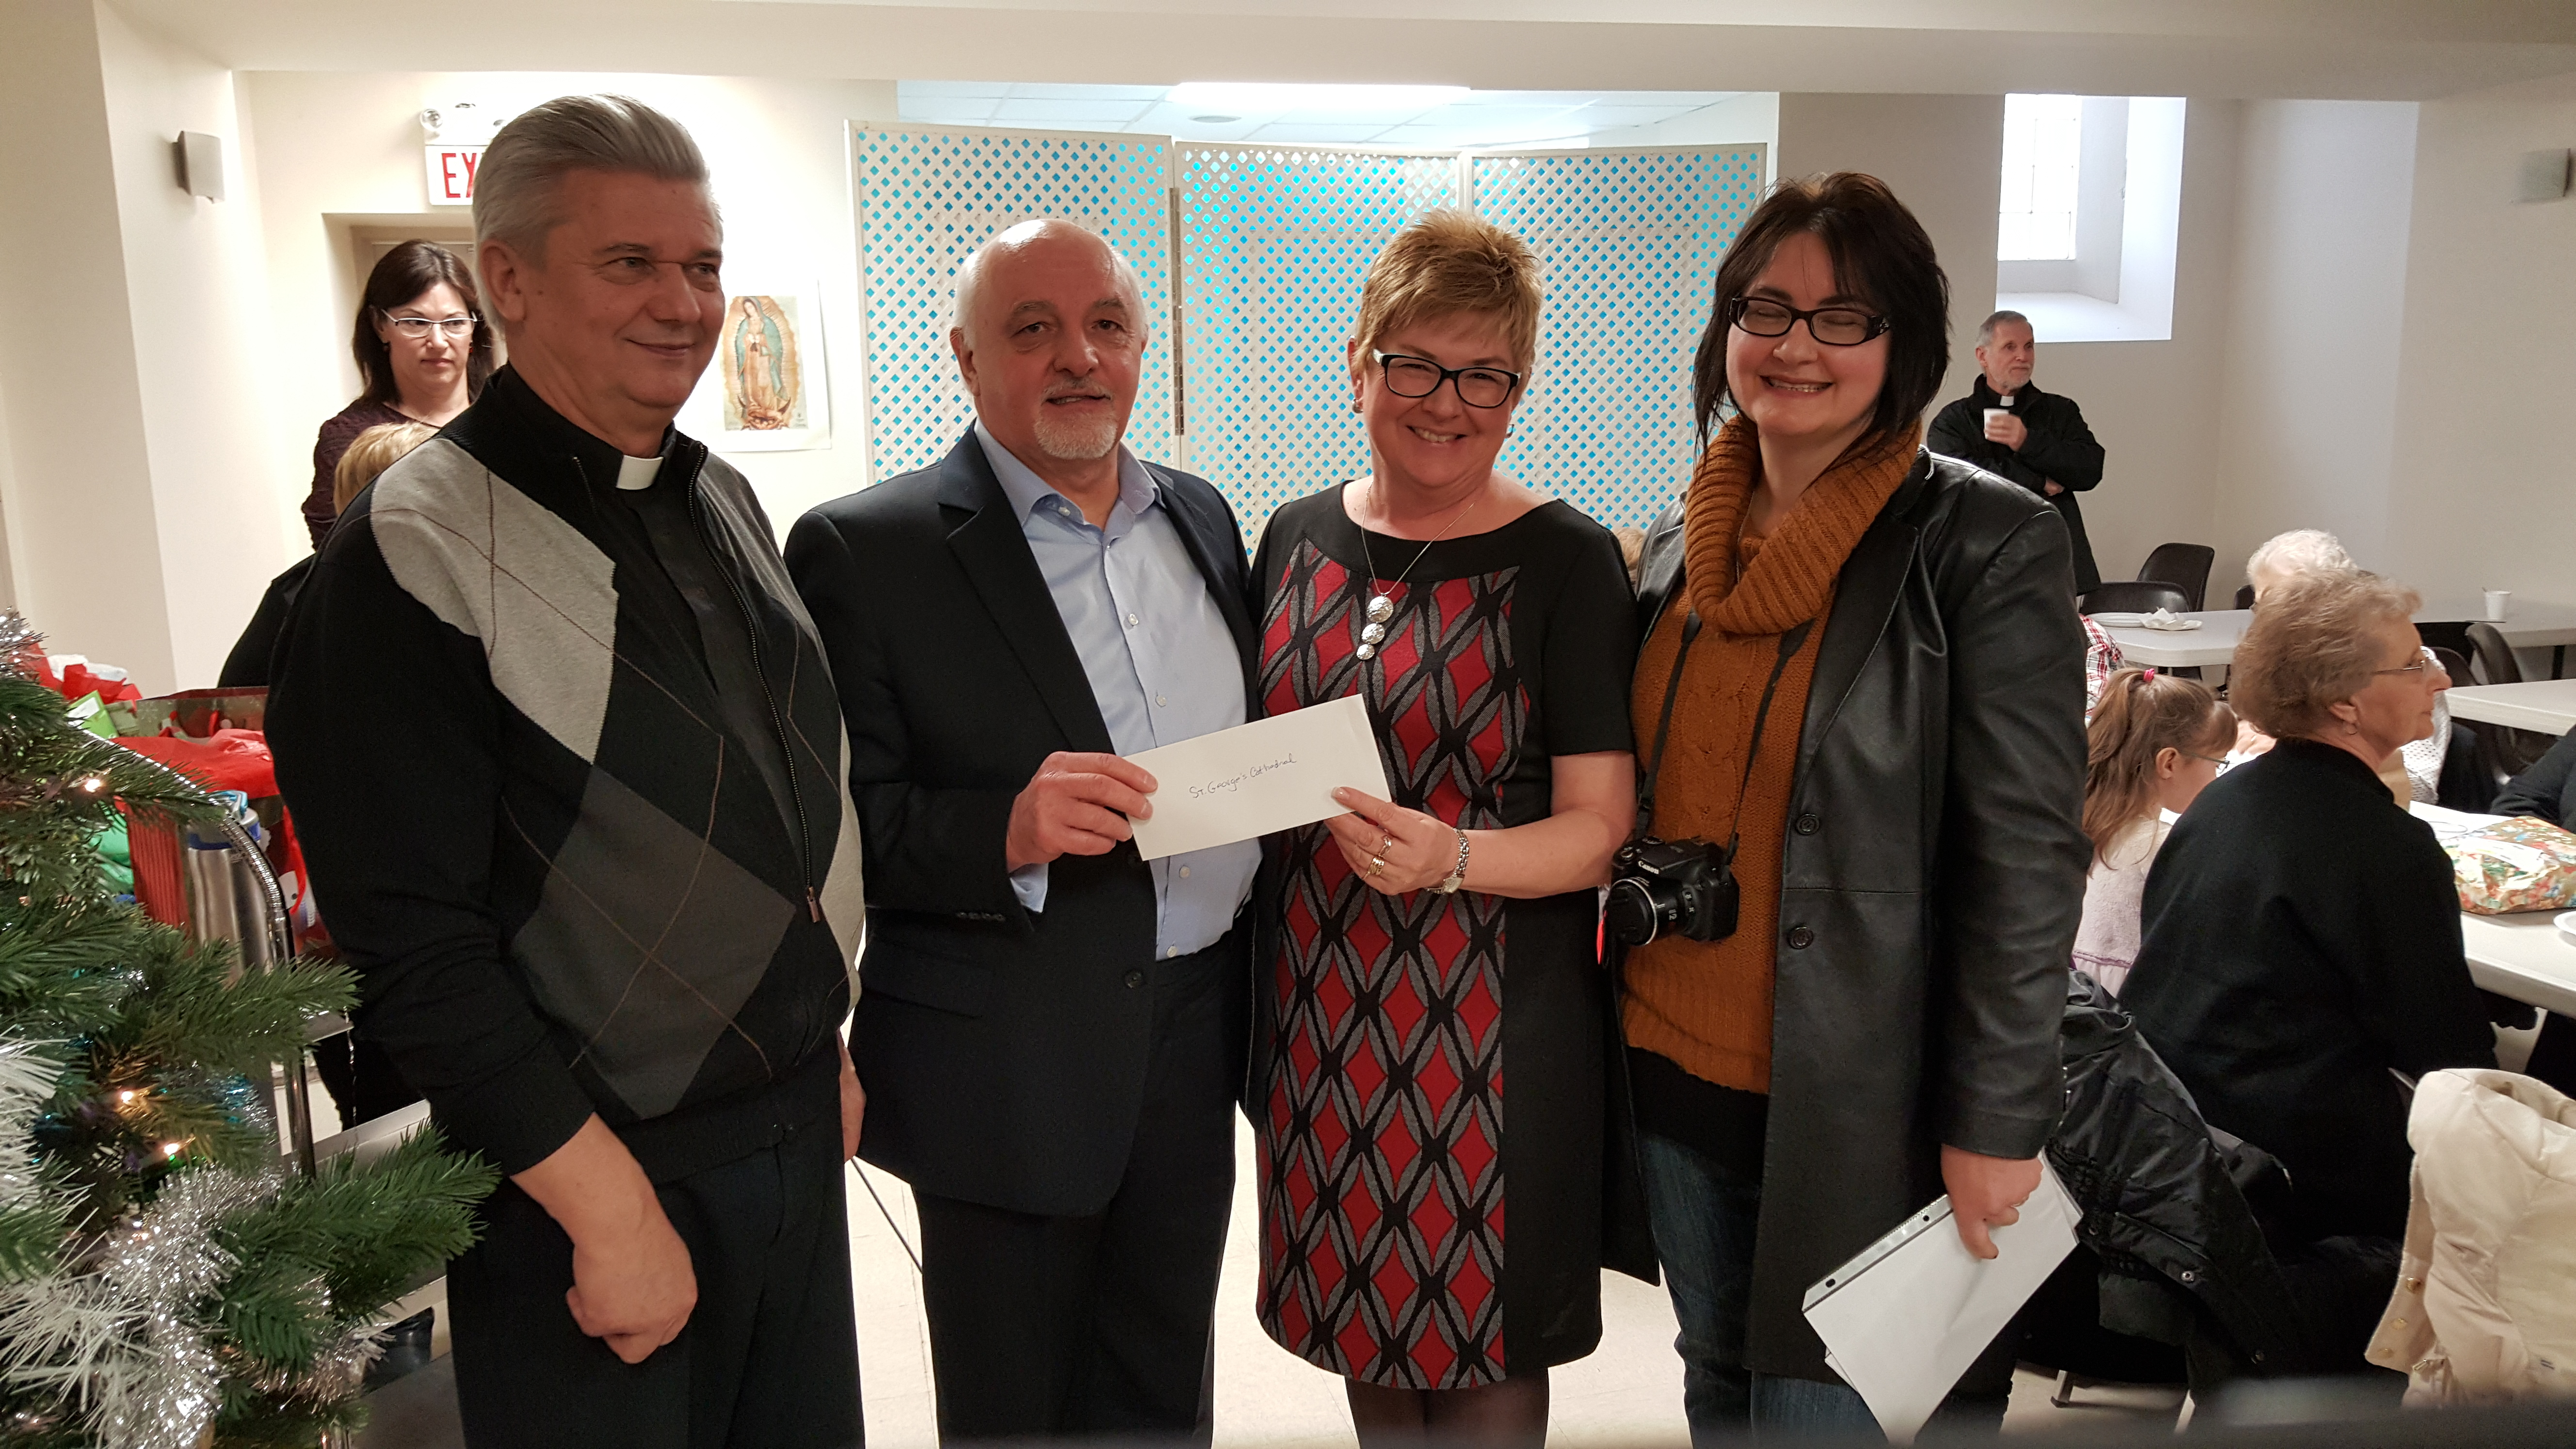 Presentation of 2015 Eparchial Rebate Cheque - St. George's Saskatoon-2015-12-20